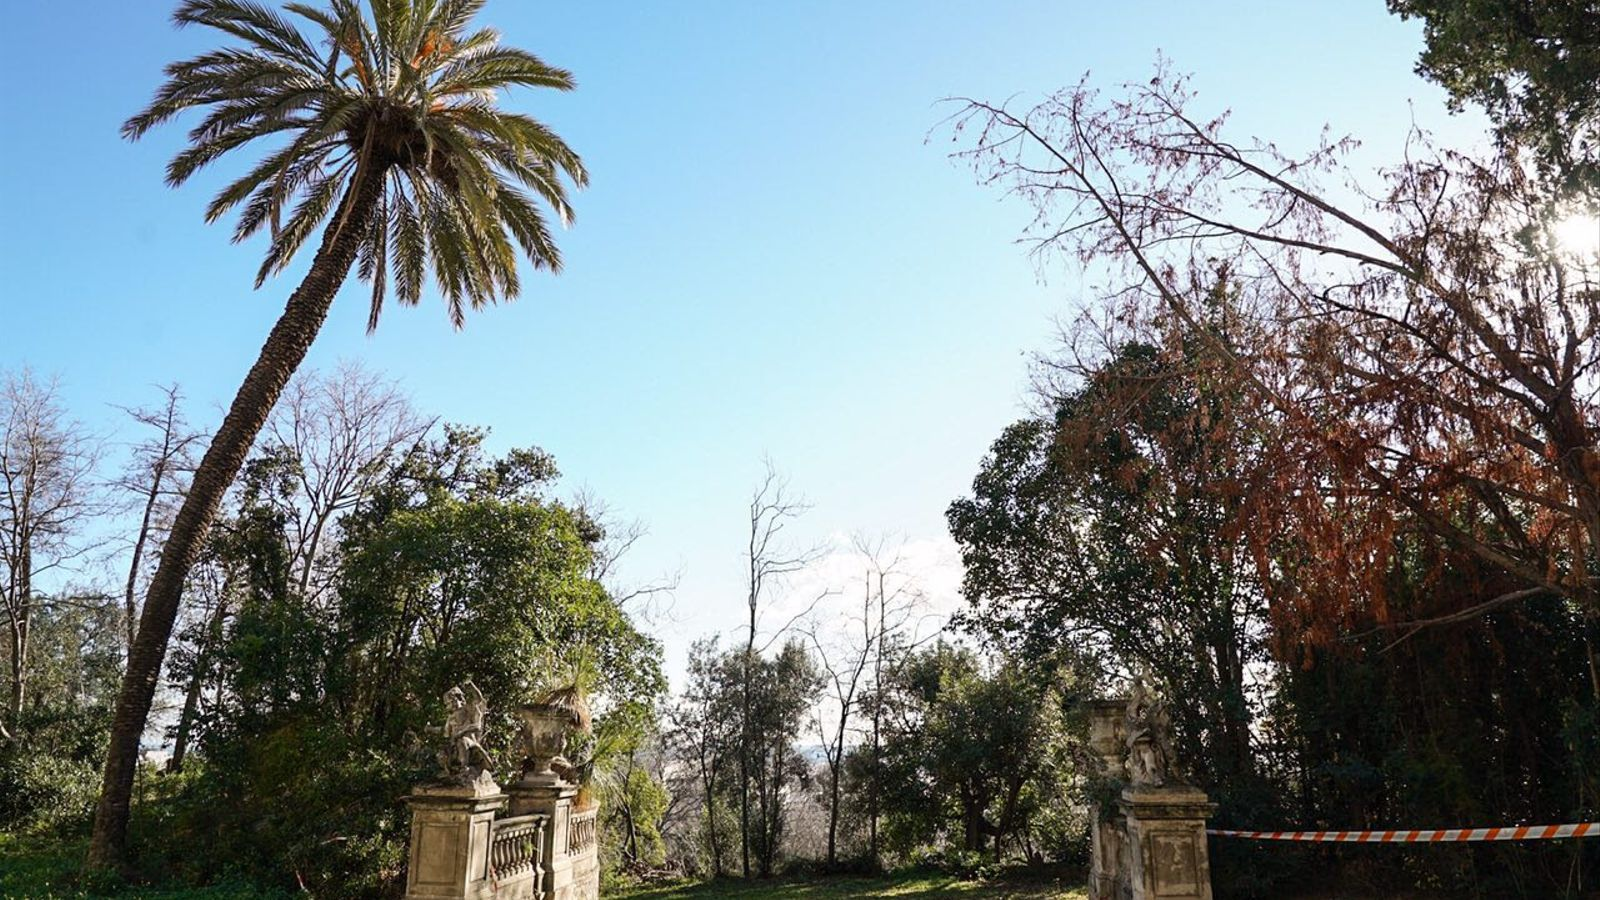 Barcelona projecta una gran illa verda al Guinardó